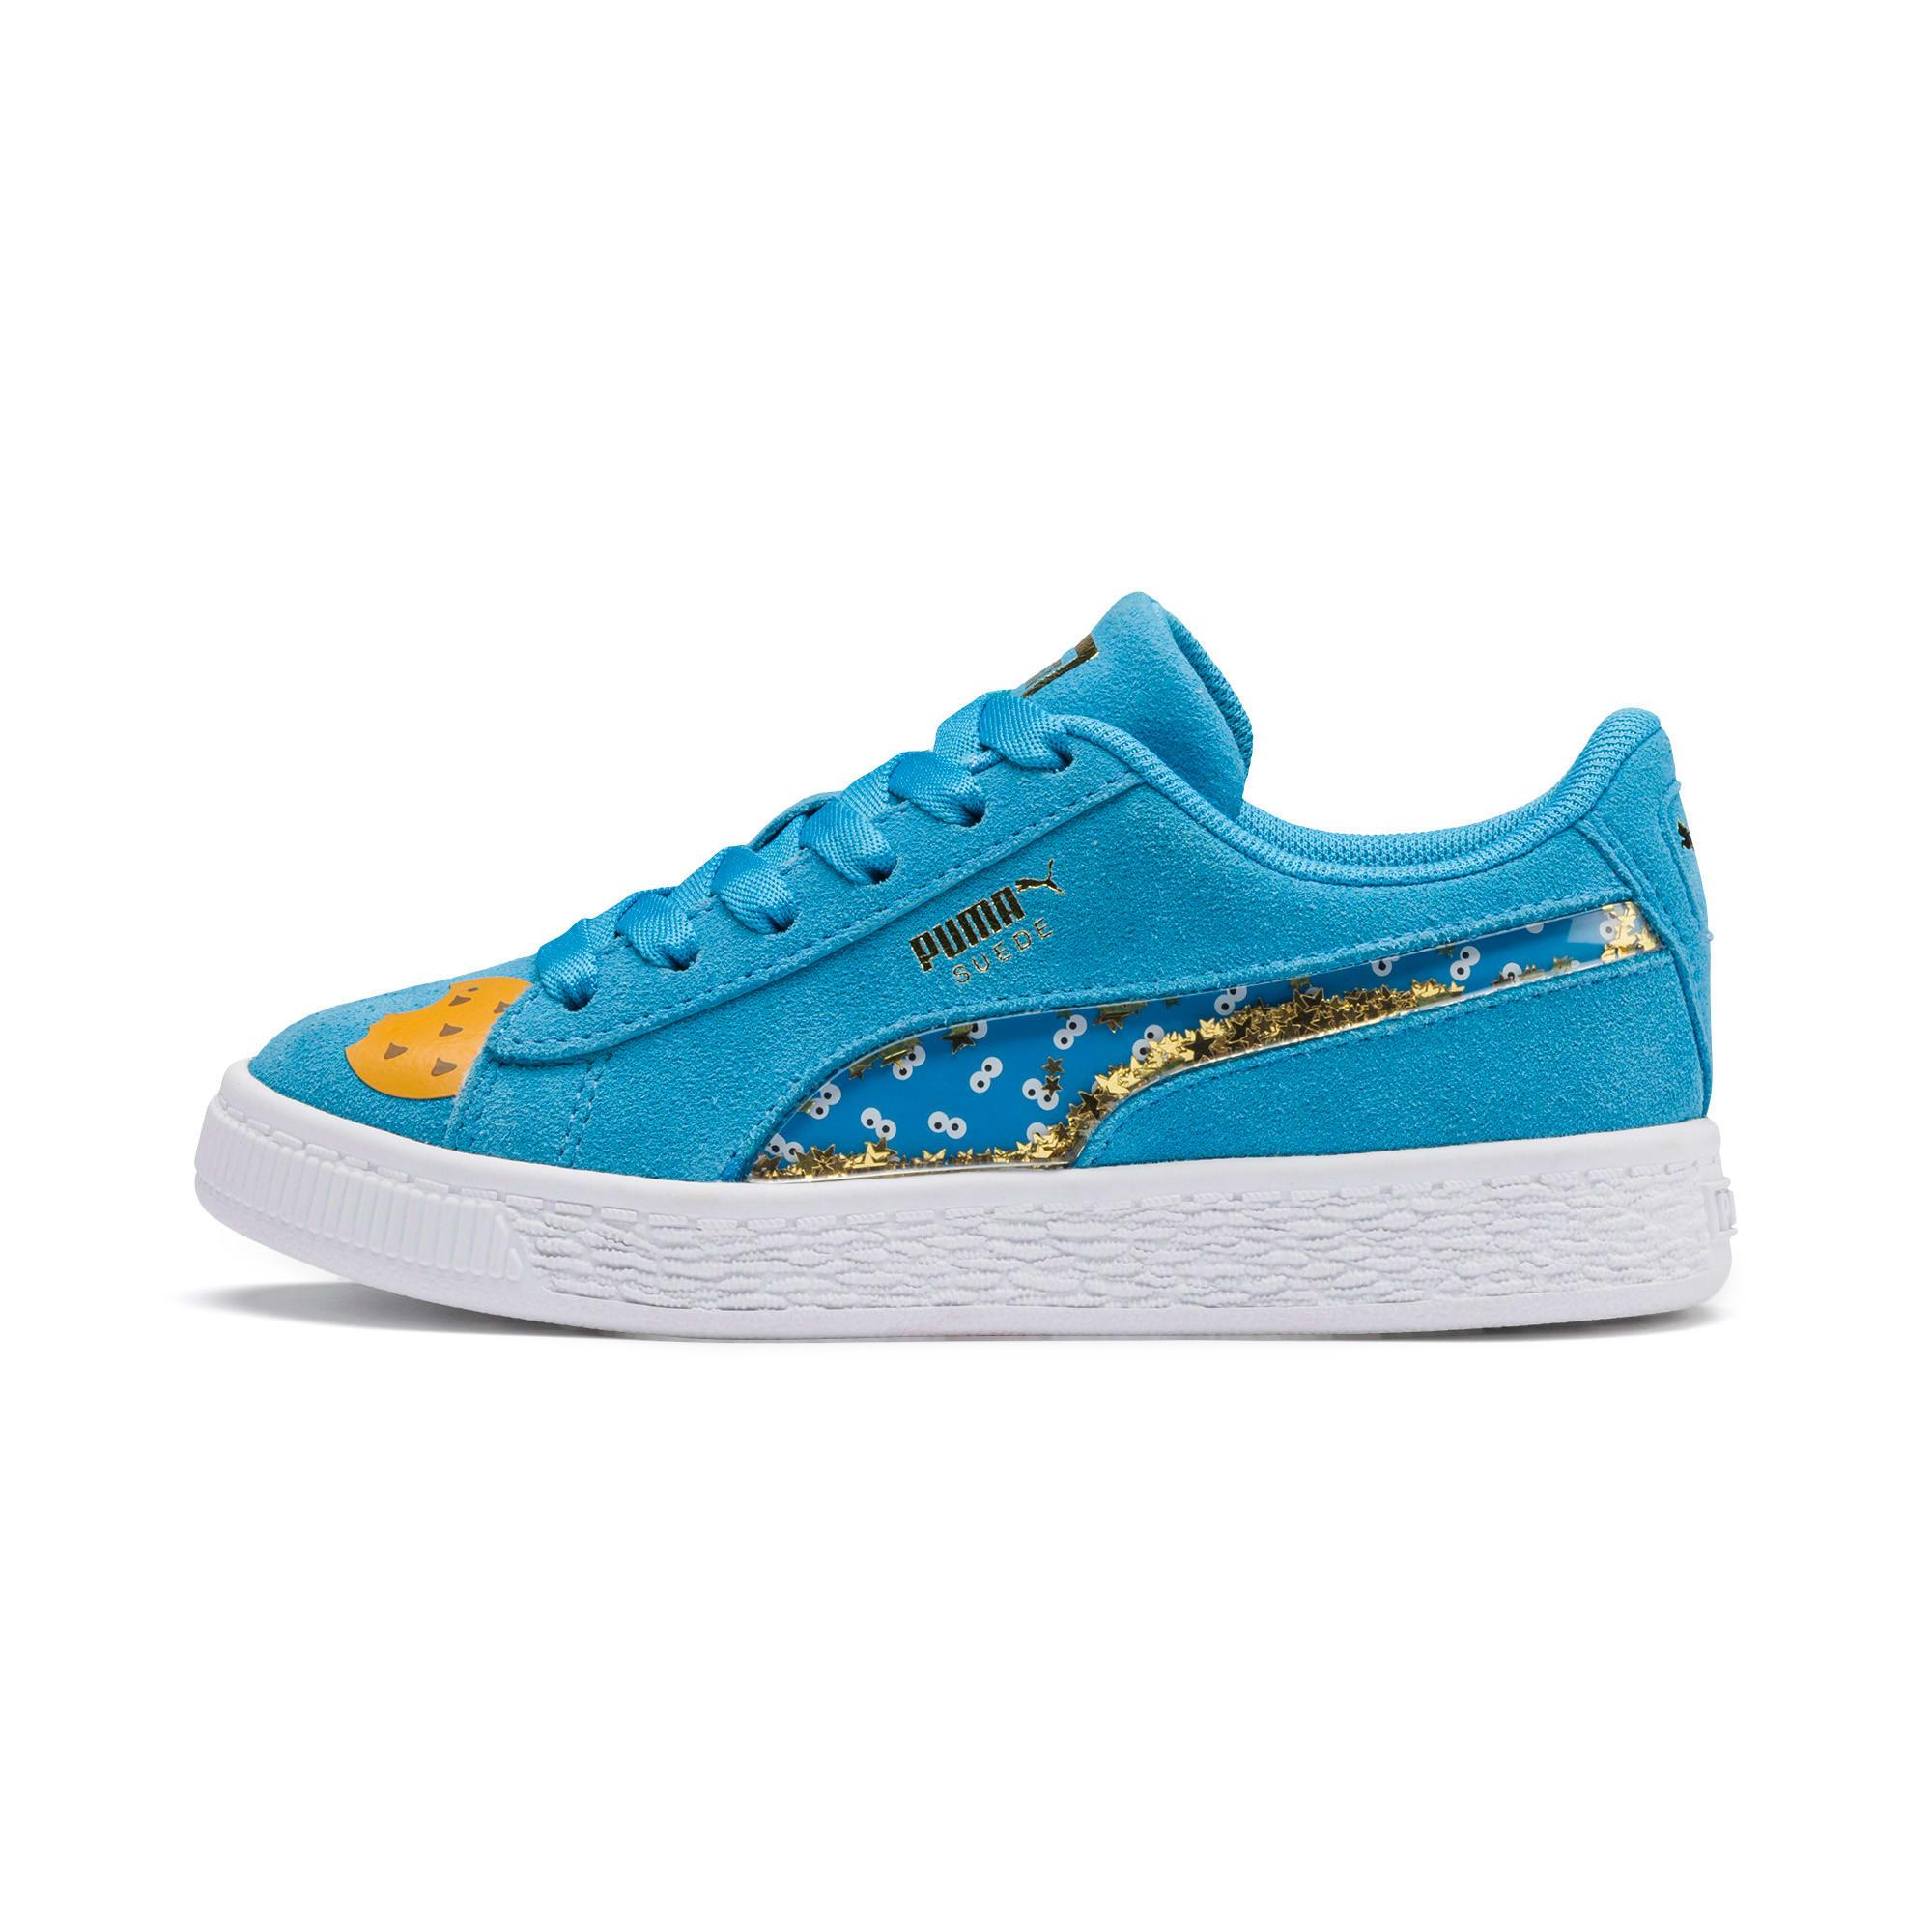 Thumbnail 1 of Sesamstraße 50 Suede Statement Kids Sneaker, Bleu Azur-Puma White, medium